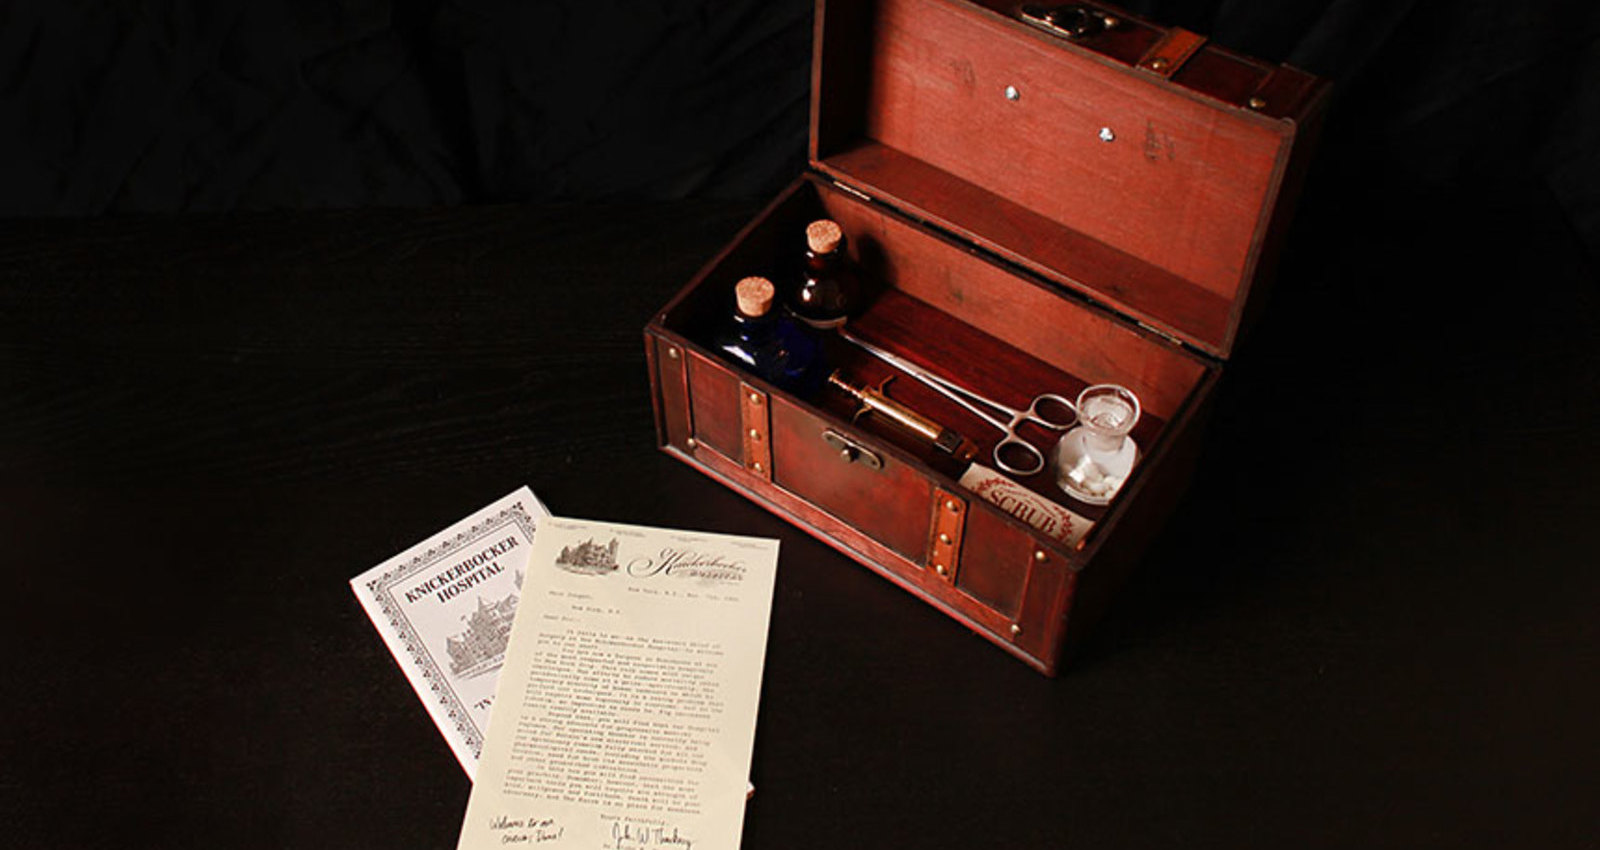 The Knick Surgeon's Box